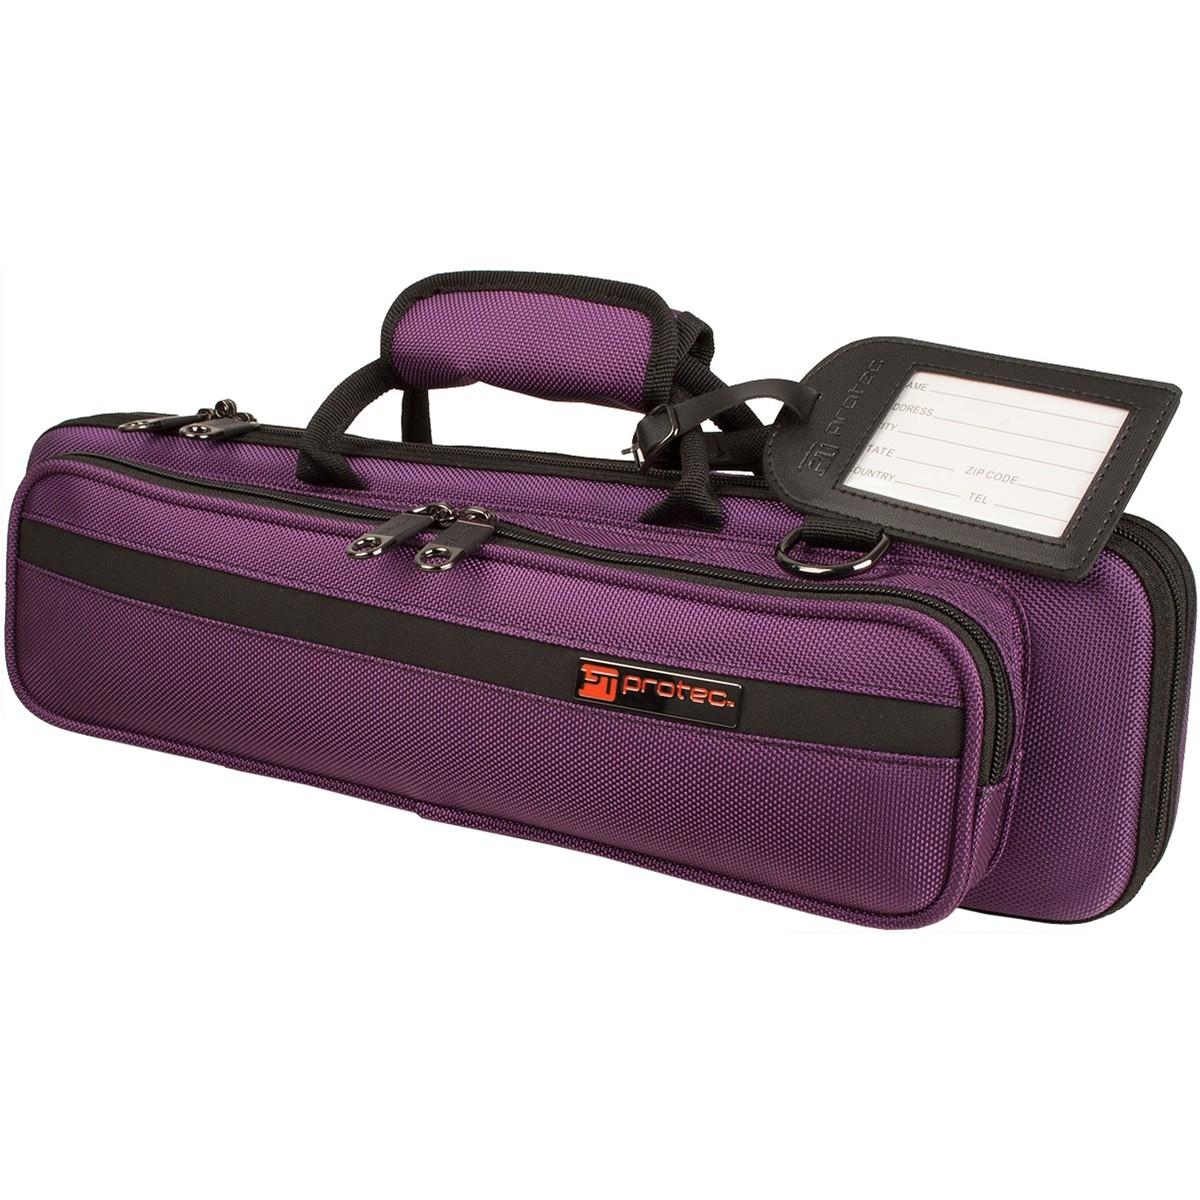 Protec Flute PRO PAC Case – Slimline (Purple PB308PR)